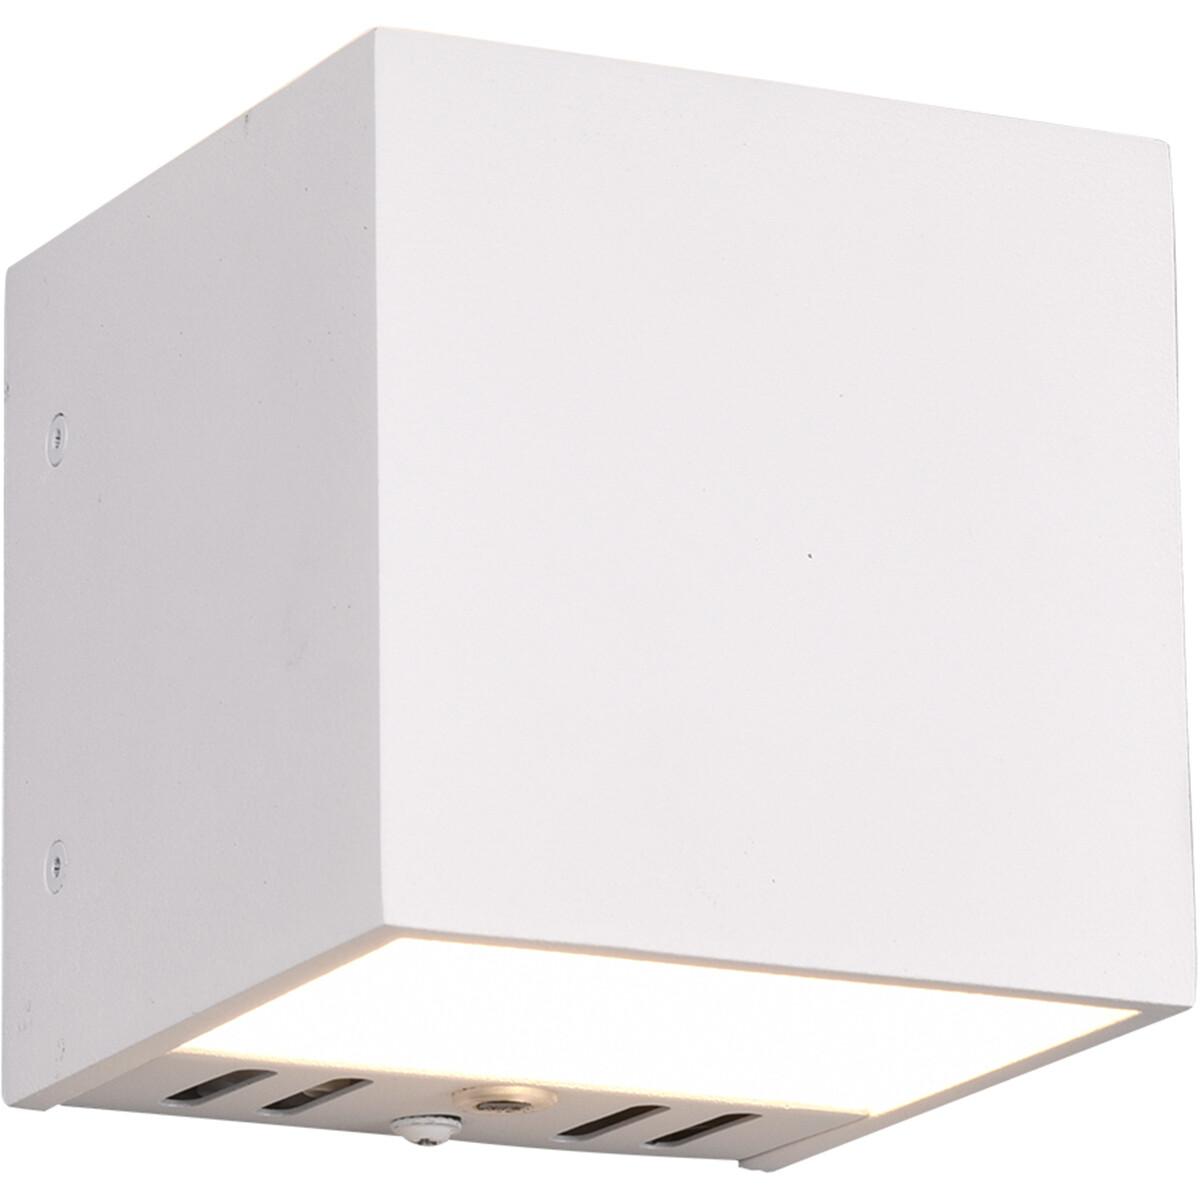 LED Wandlamp WiZ - Smart LED - Trion Figlio - 5W - Aanpasbare Kleur - RGBW - Vierkant - Mat Wit - Al